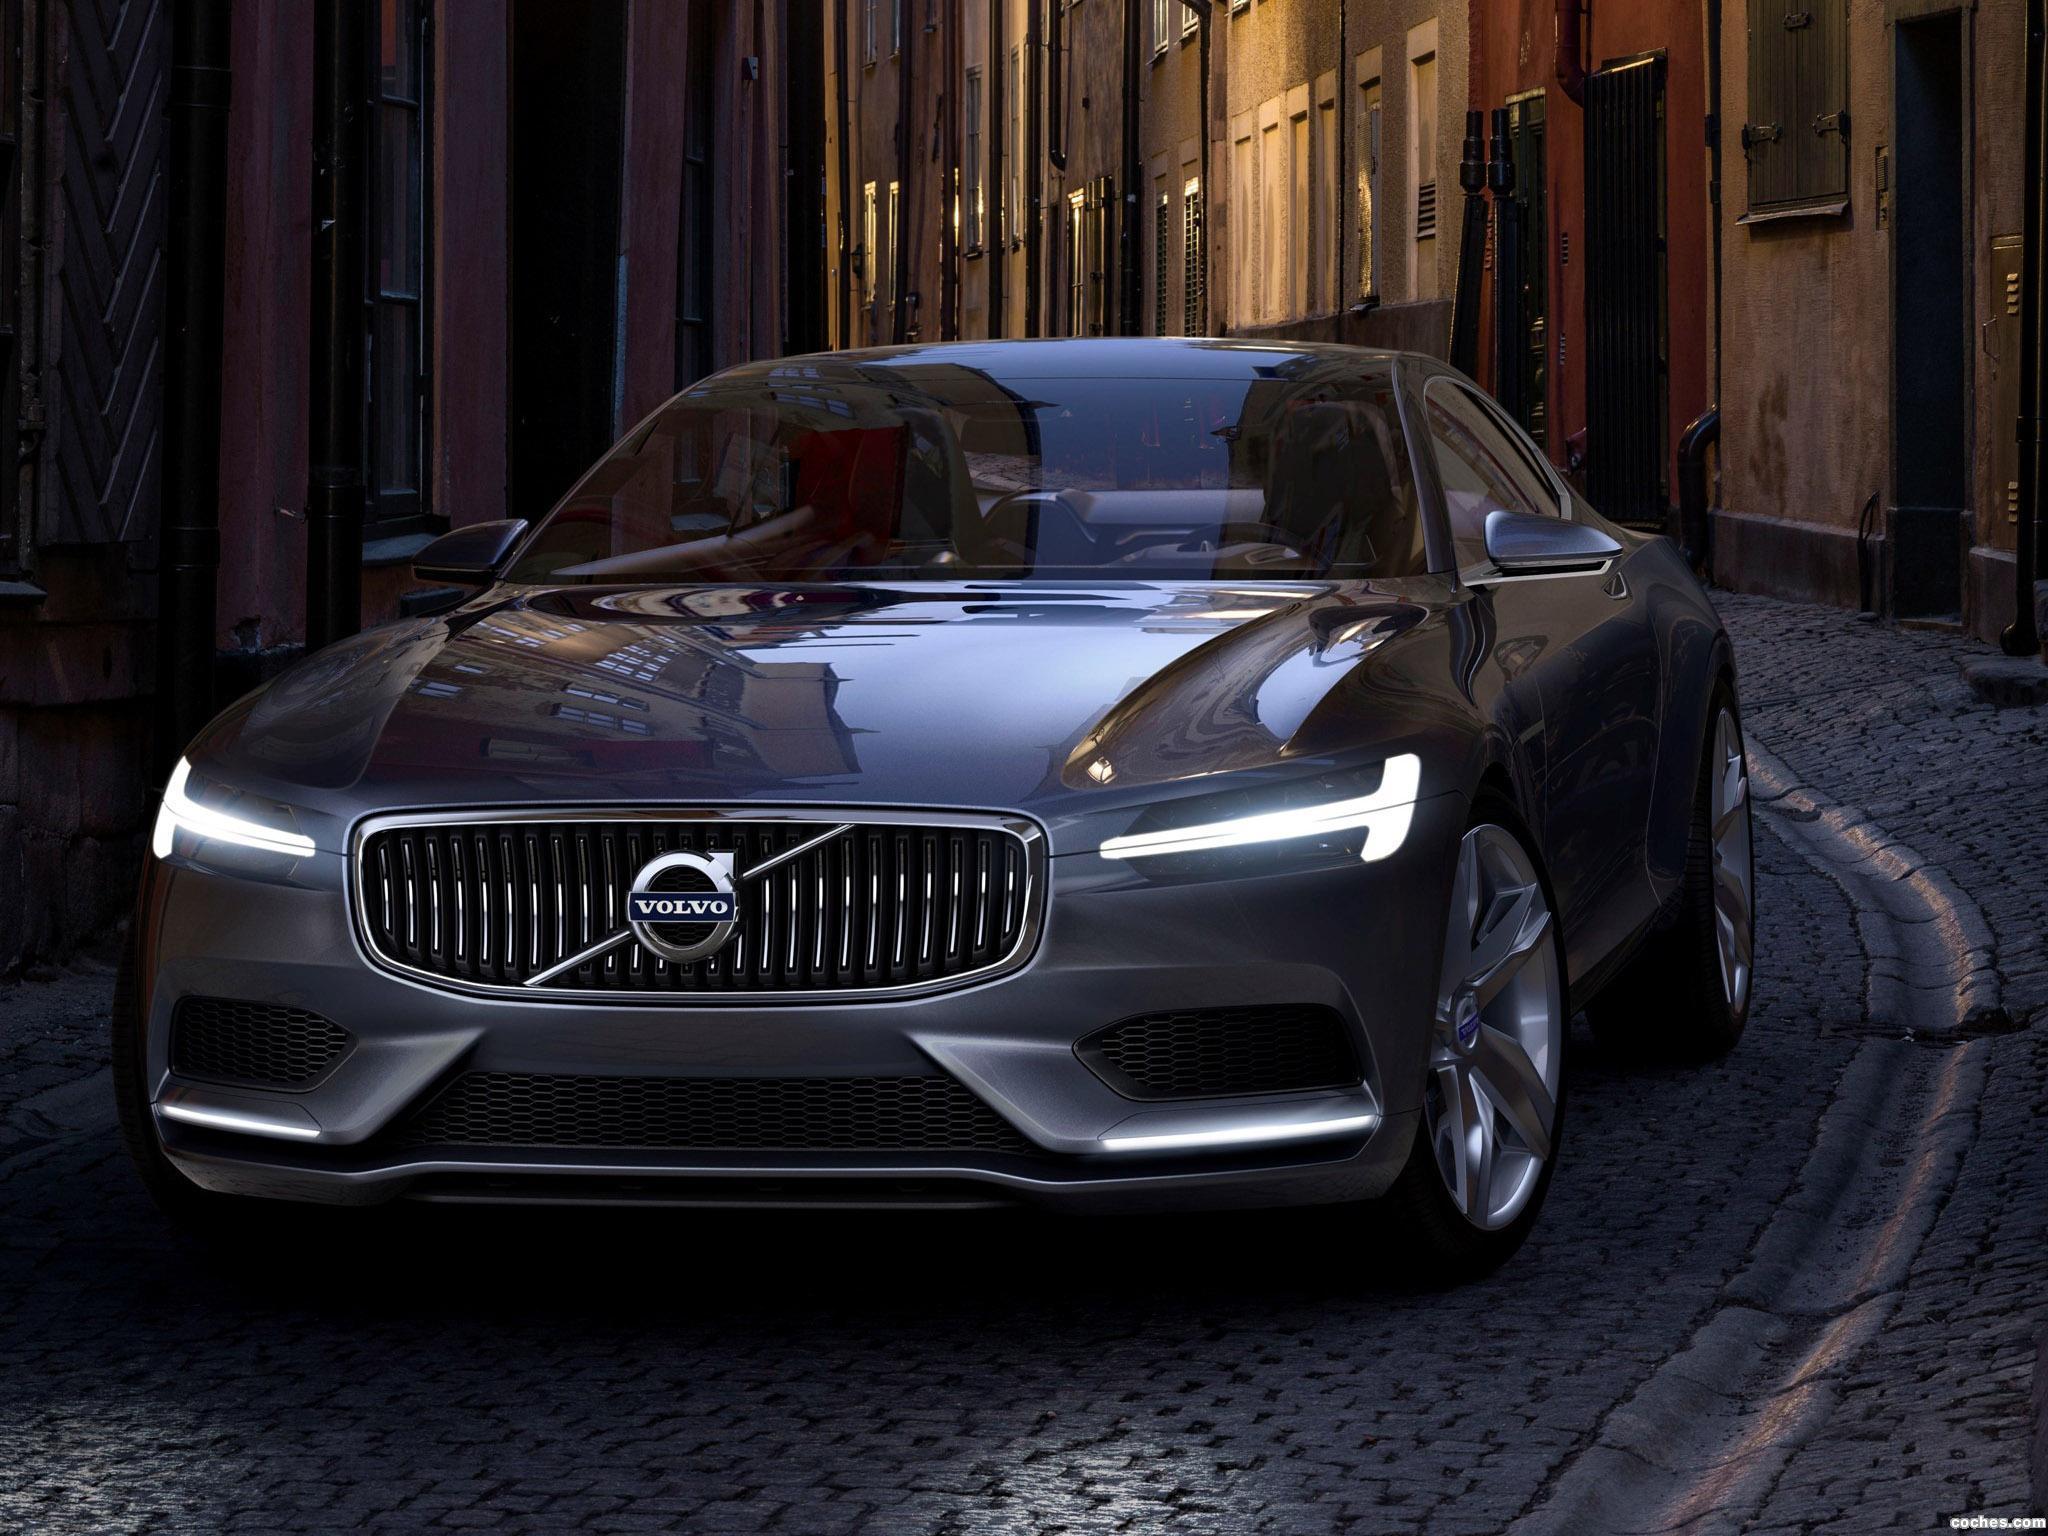 Foto 0 de Volvo Coupe Concept 2013